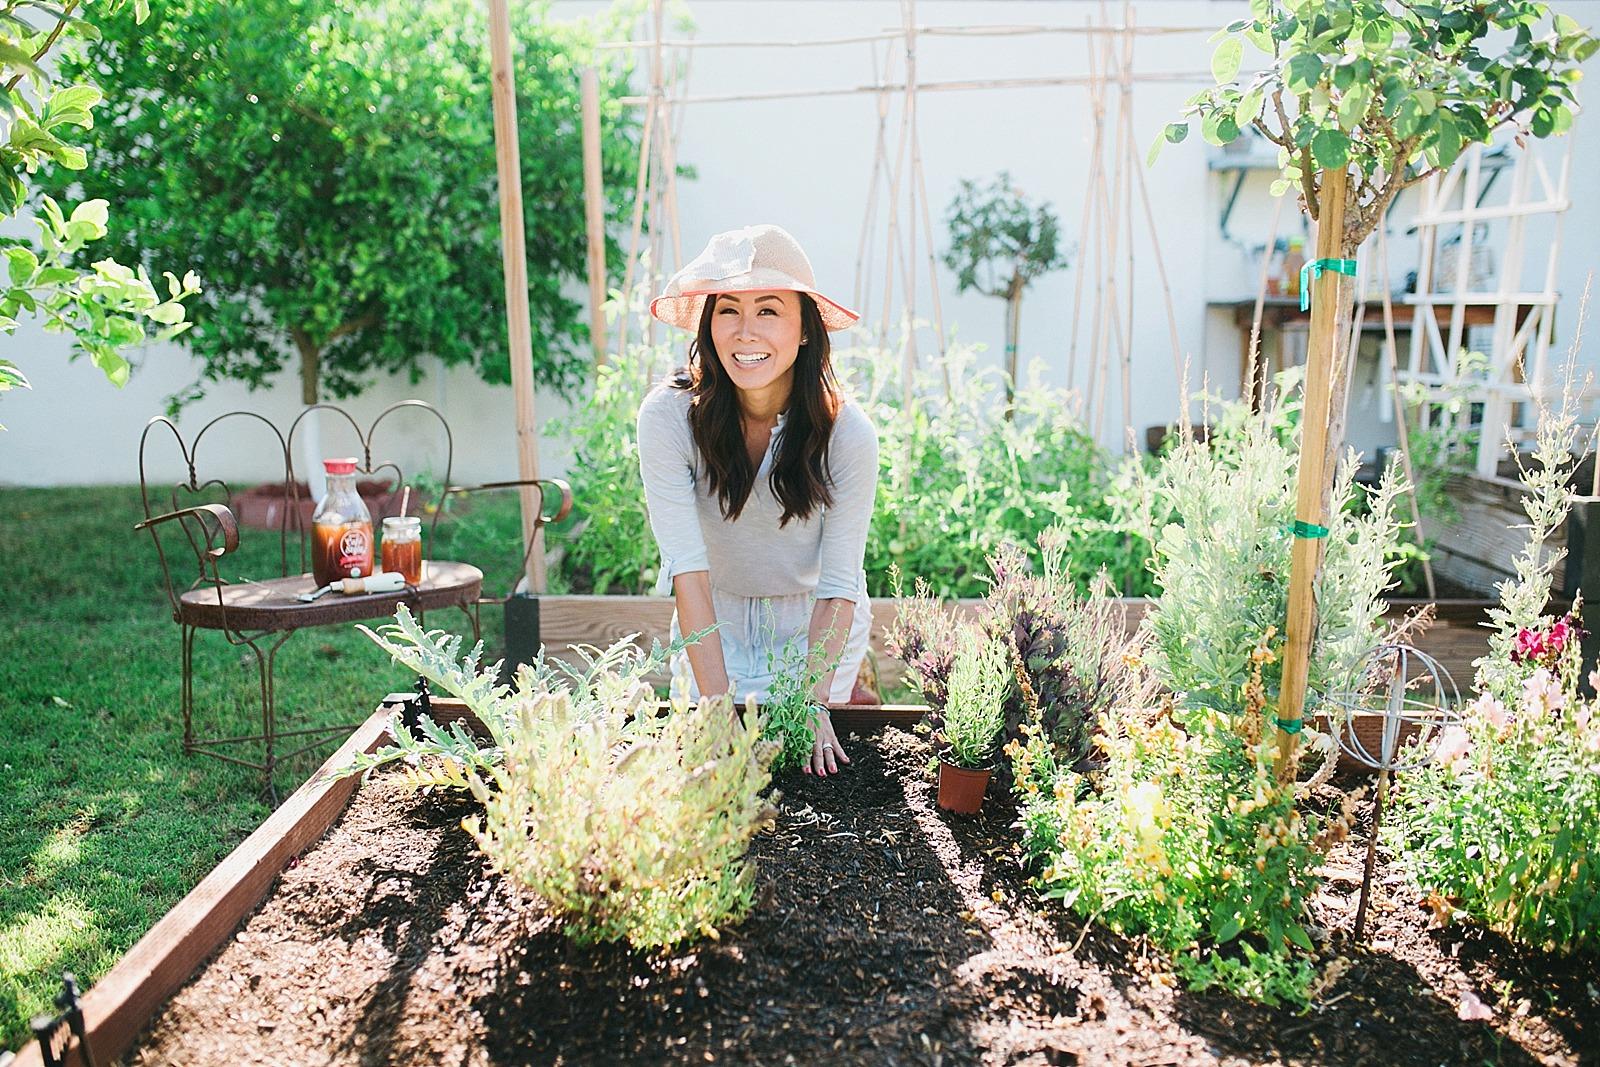 milo-iced-tea-gardening-lifestyle-blogger-diana-elizabeth-blog_0054